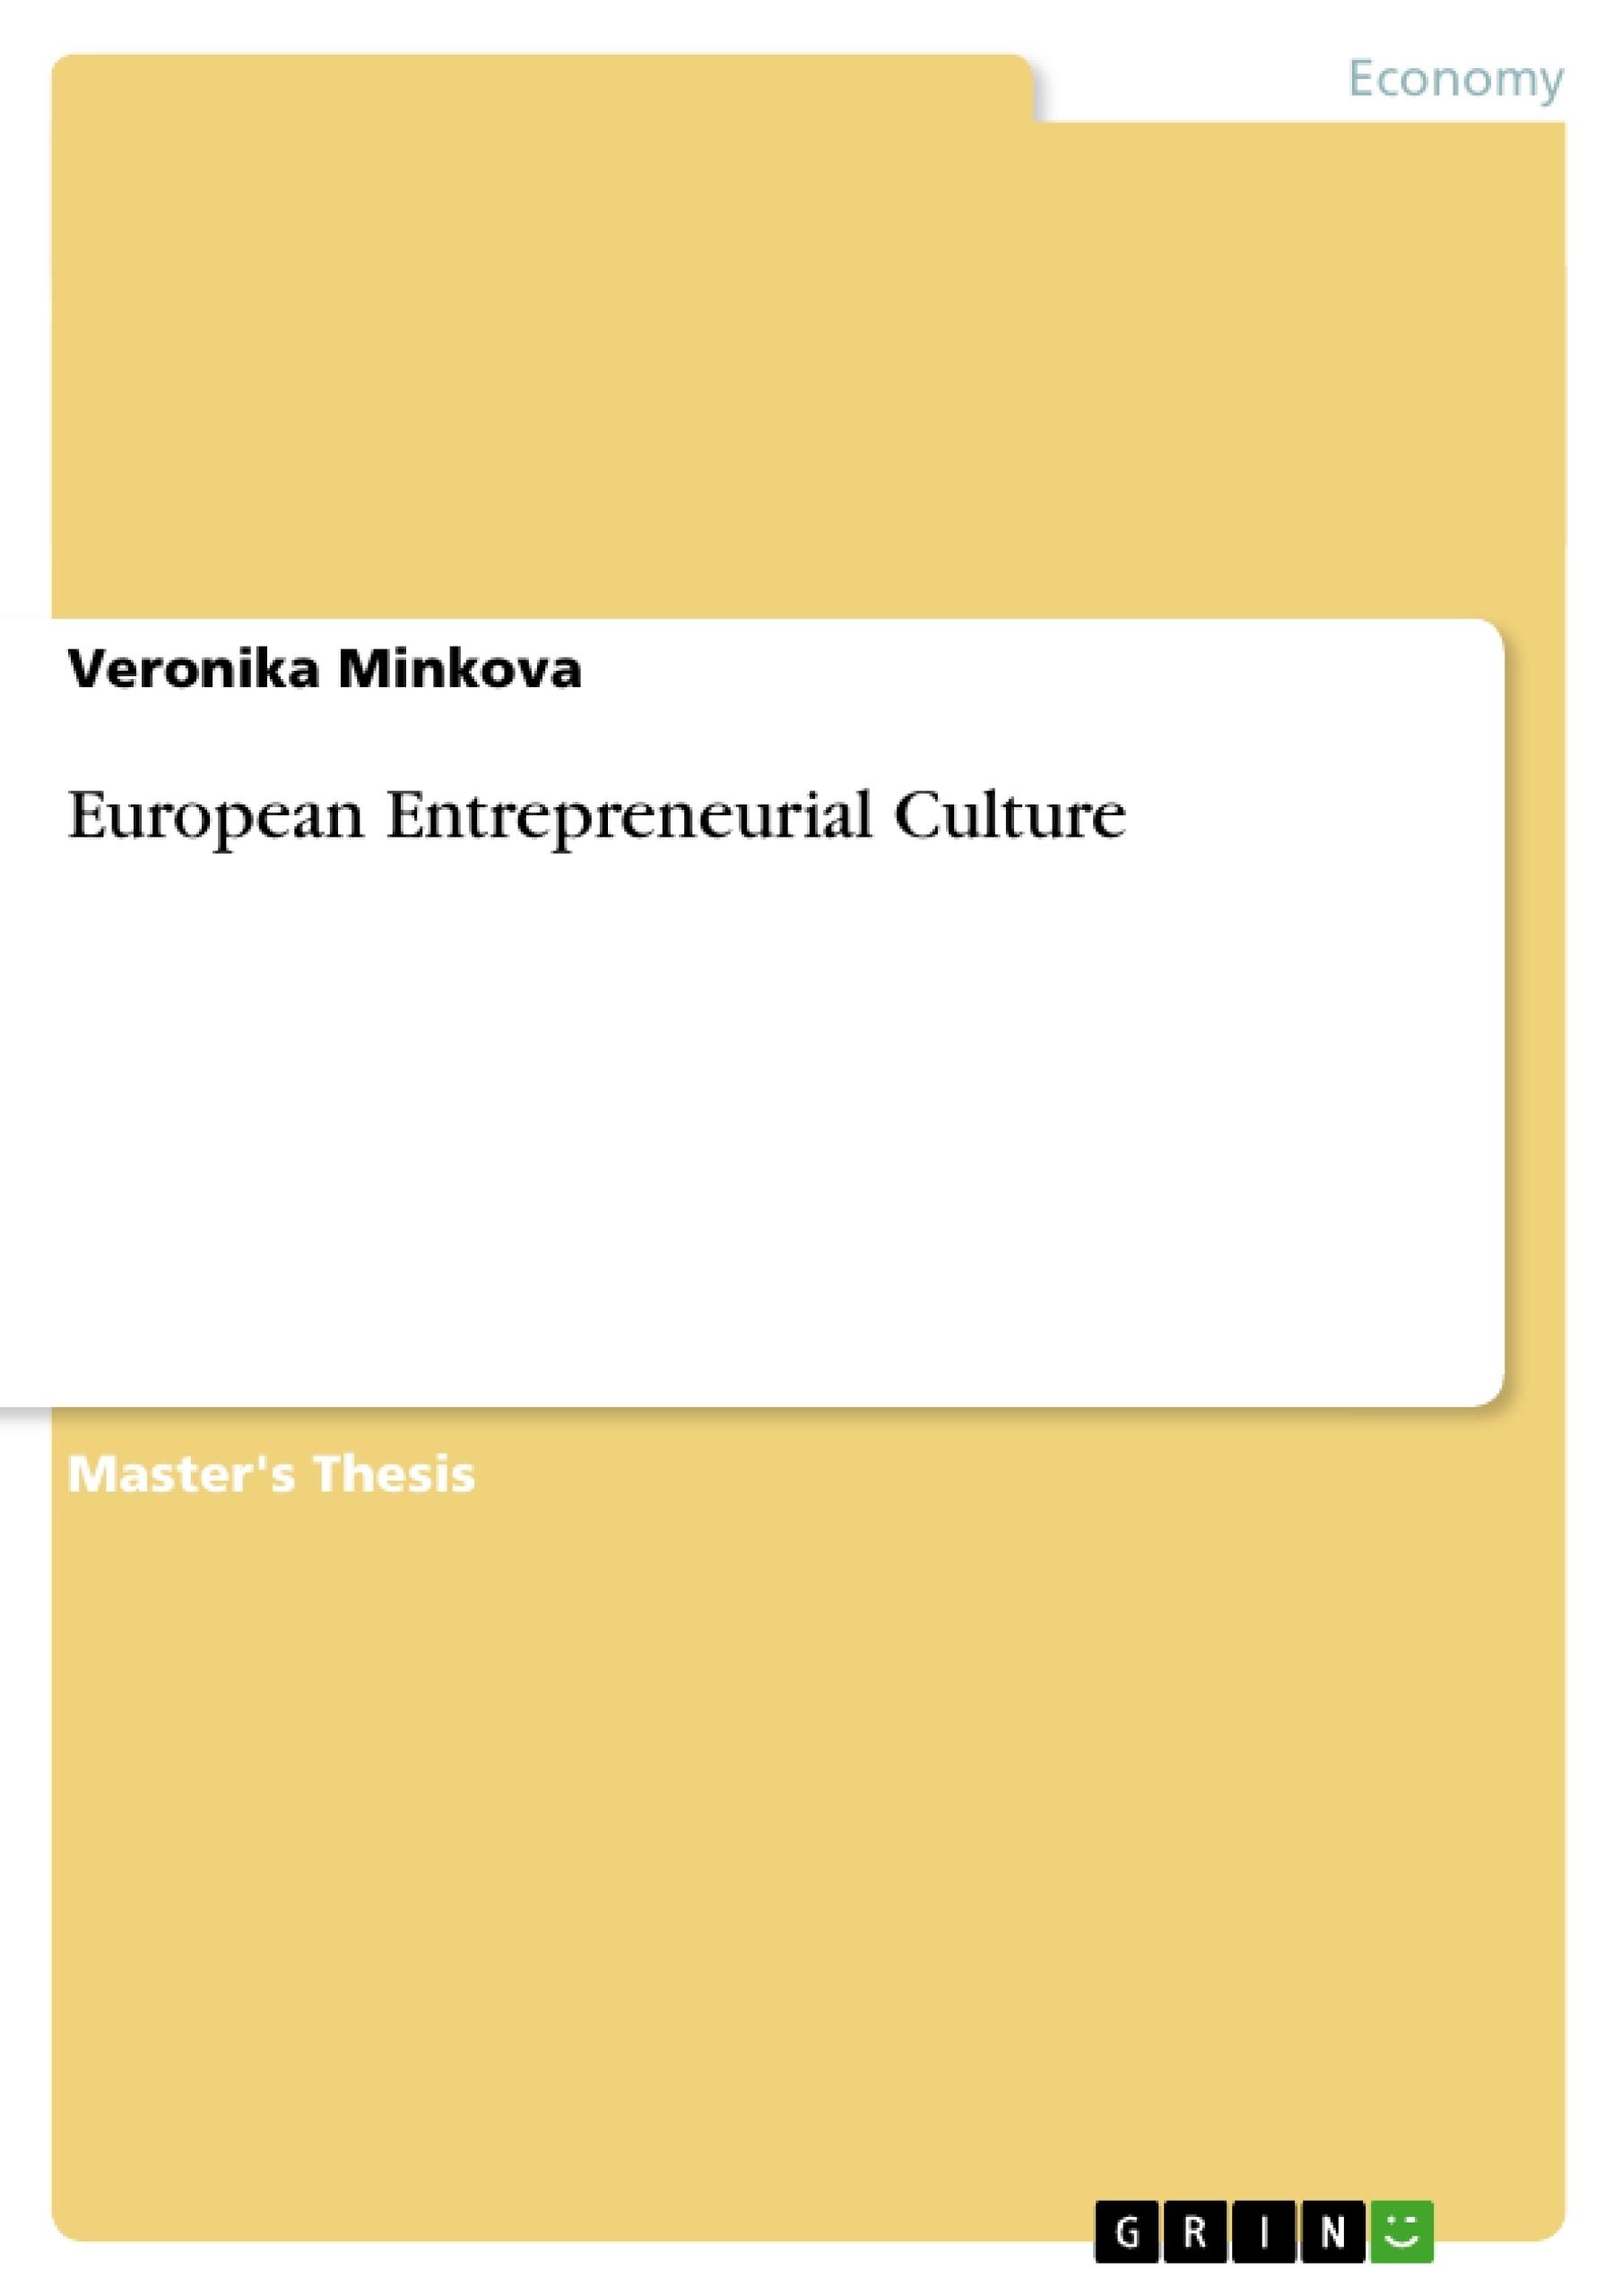 Title: European Entrepreneurial Culture